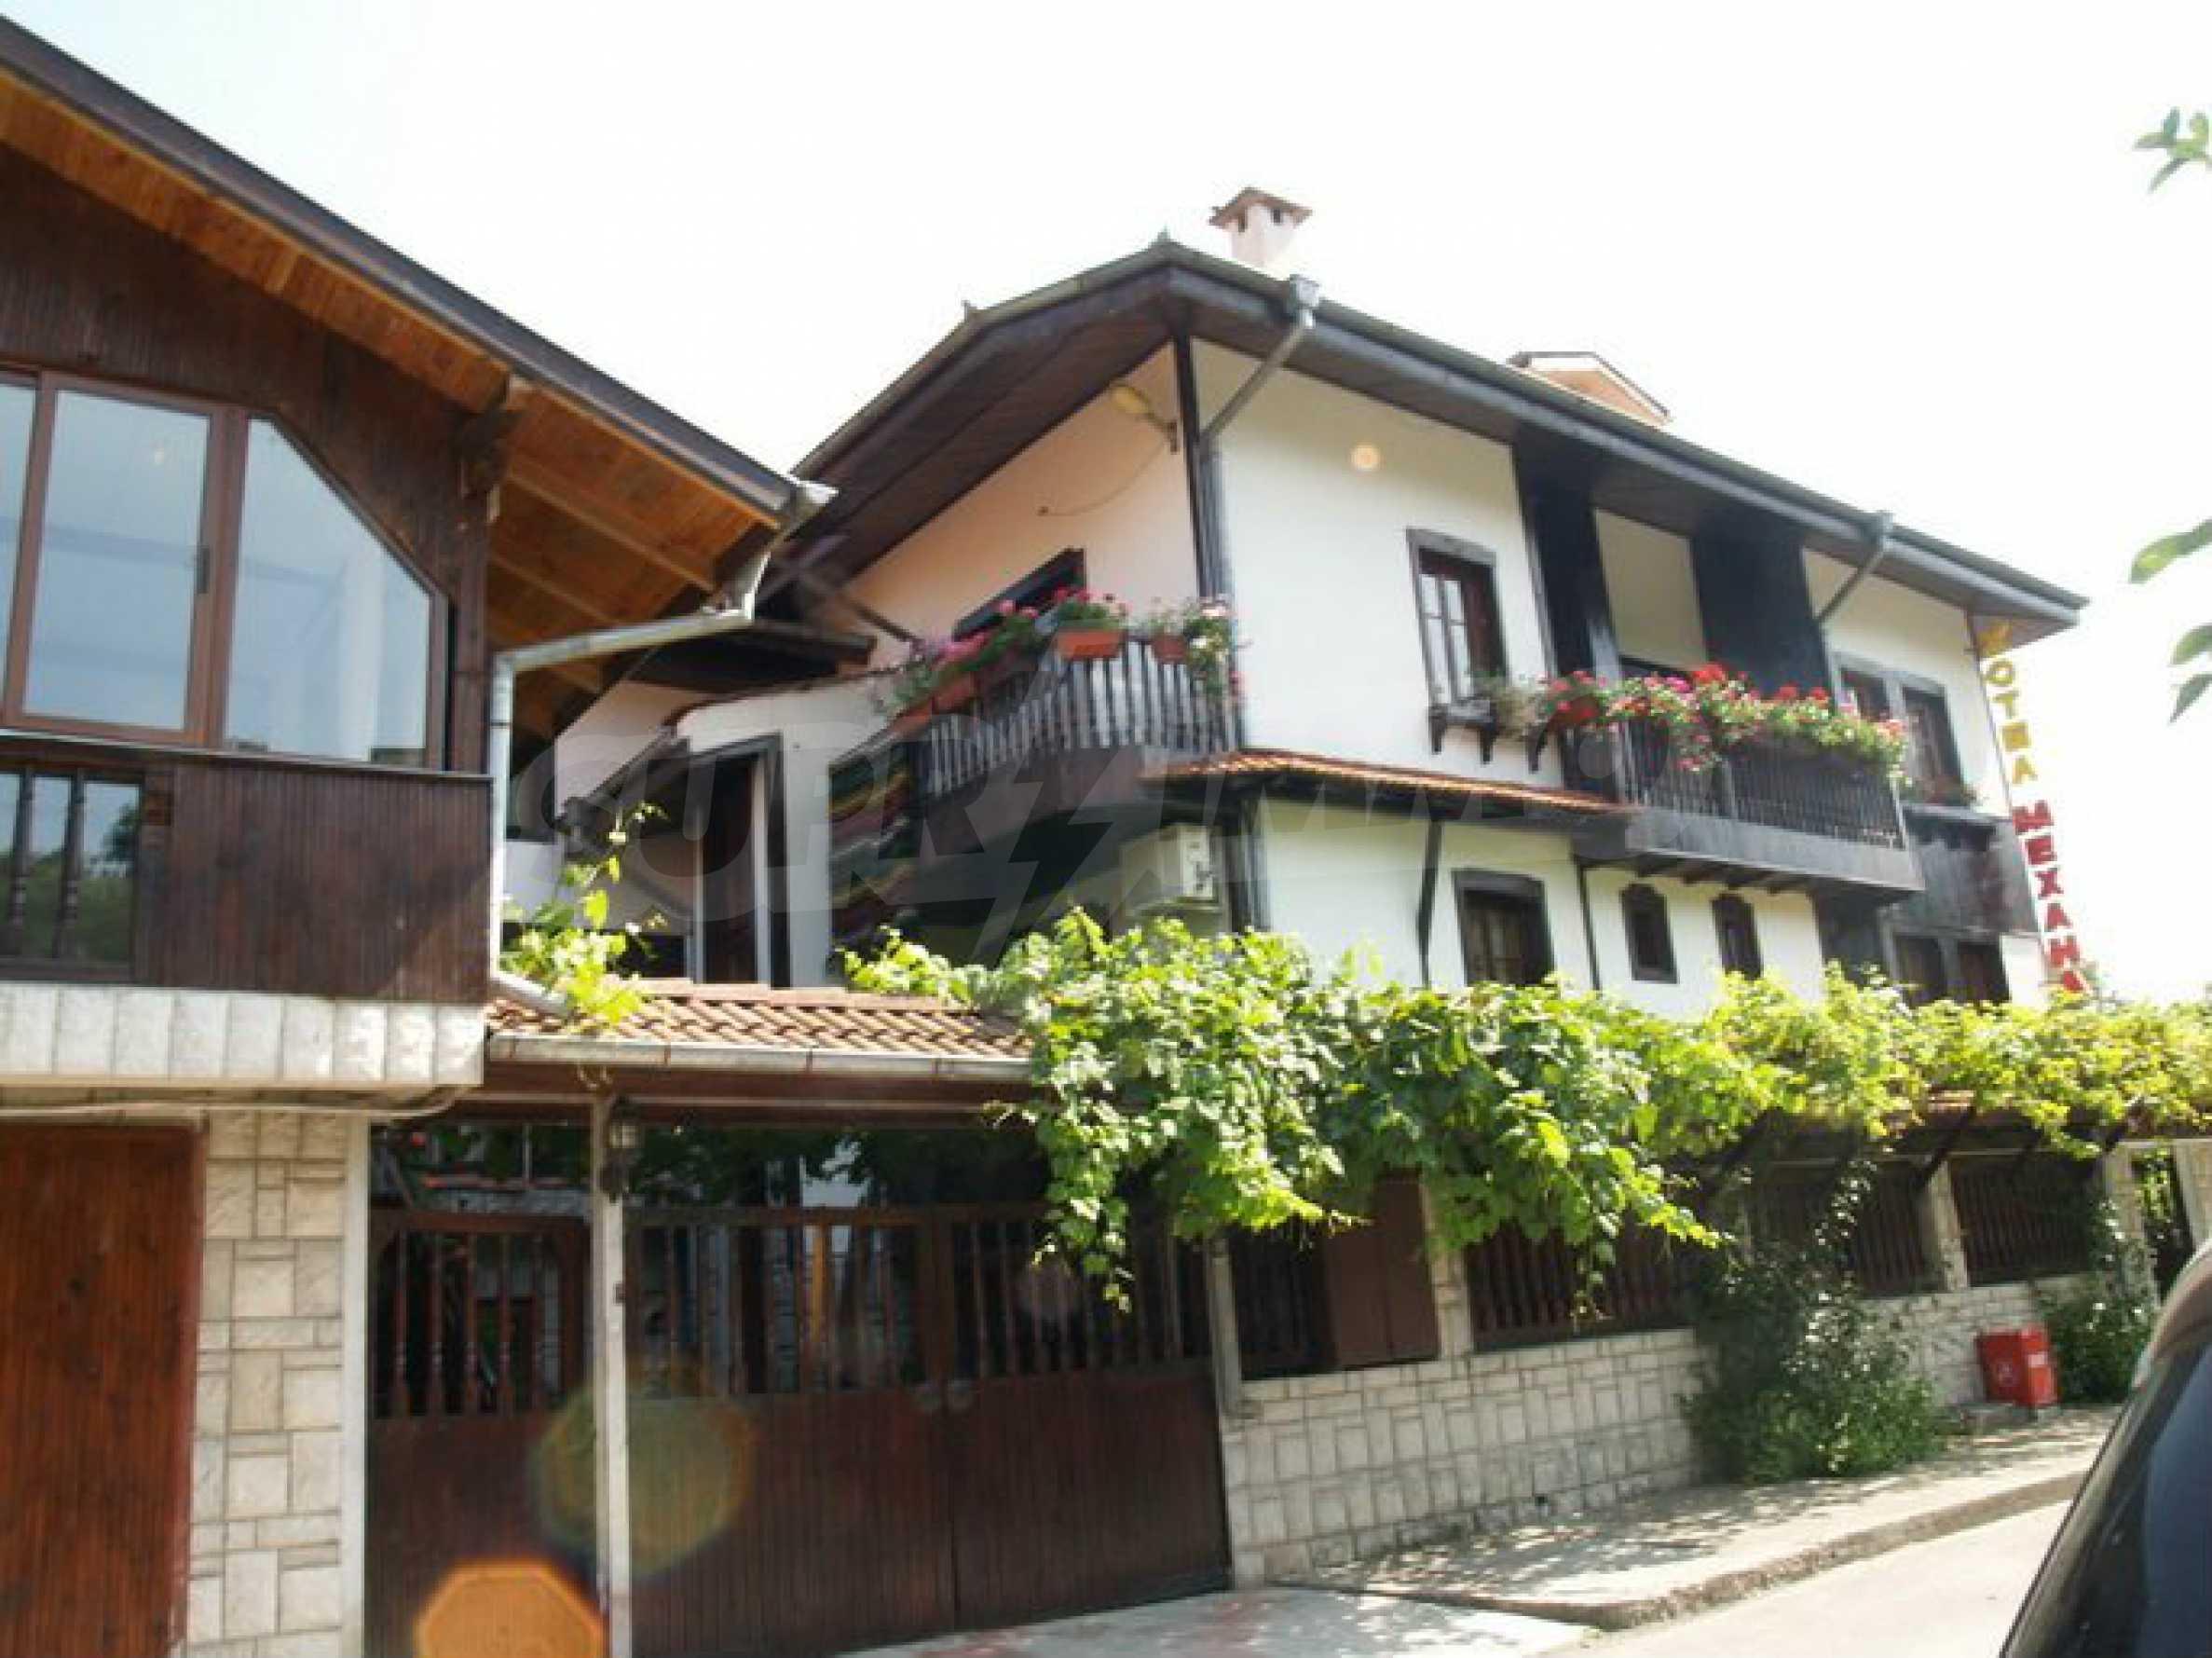 Hotelanlage mit Restaurant am Ufer des Flusses Osam in Lovech 1